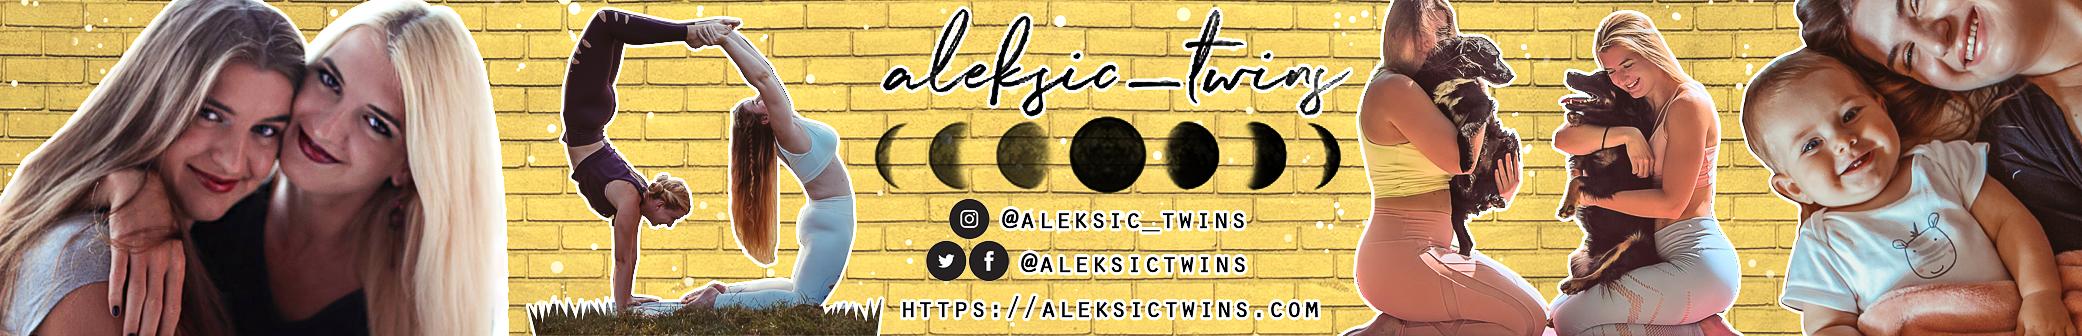 Aleksic twins banner